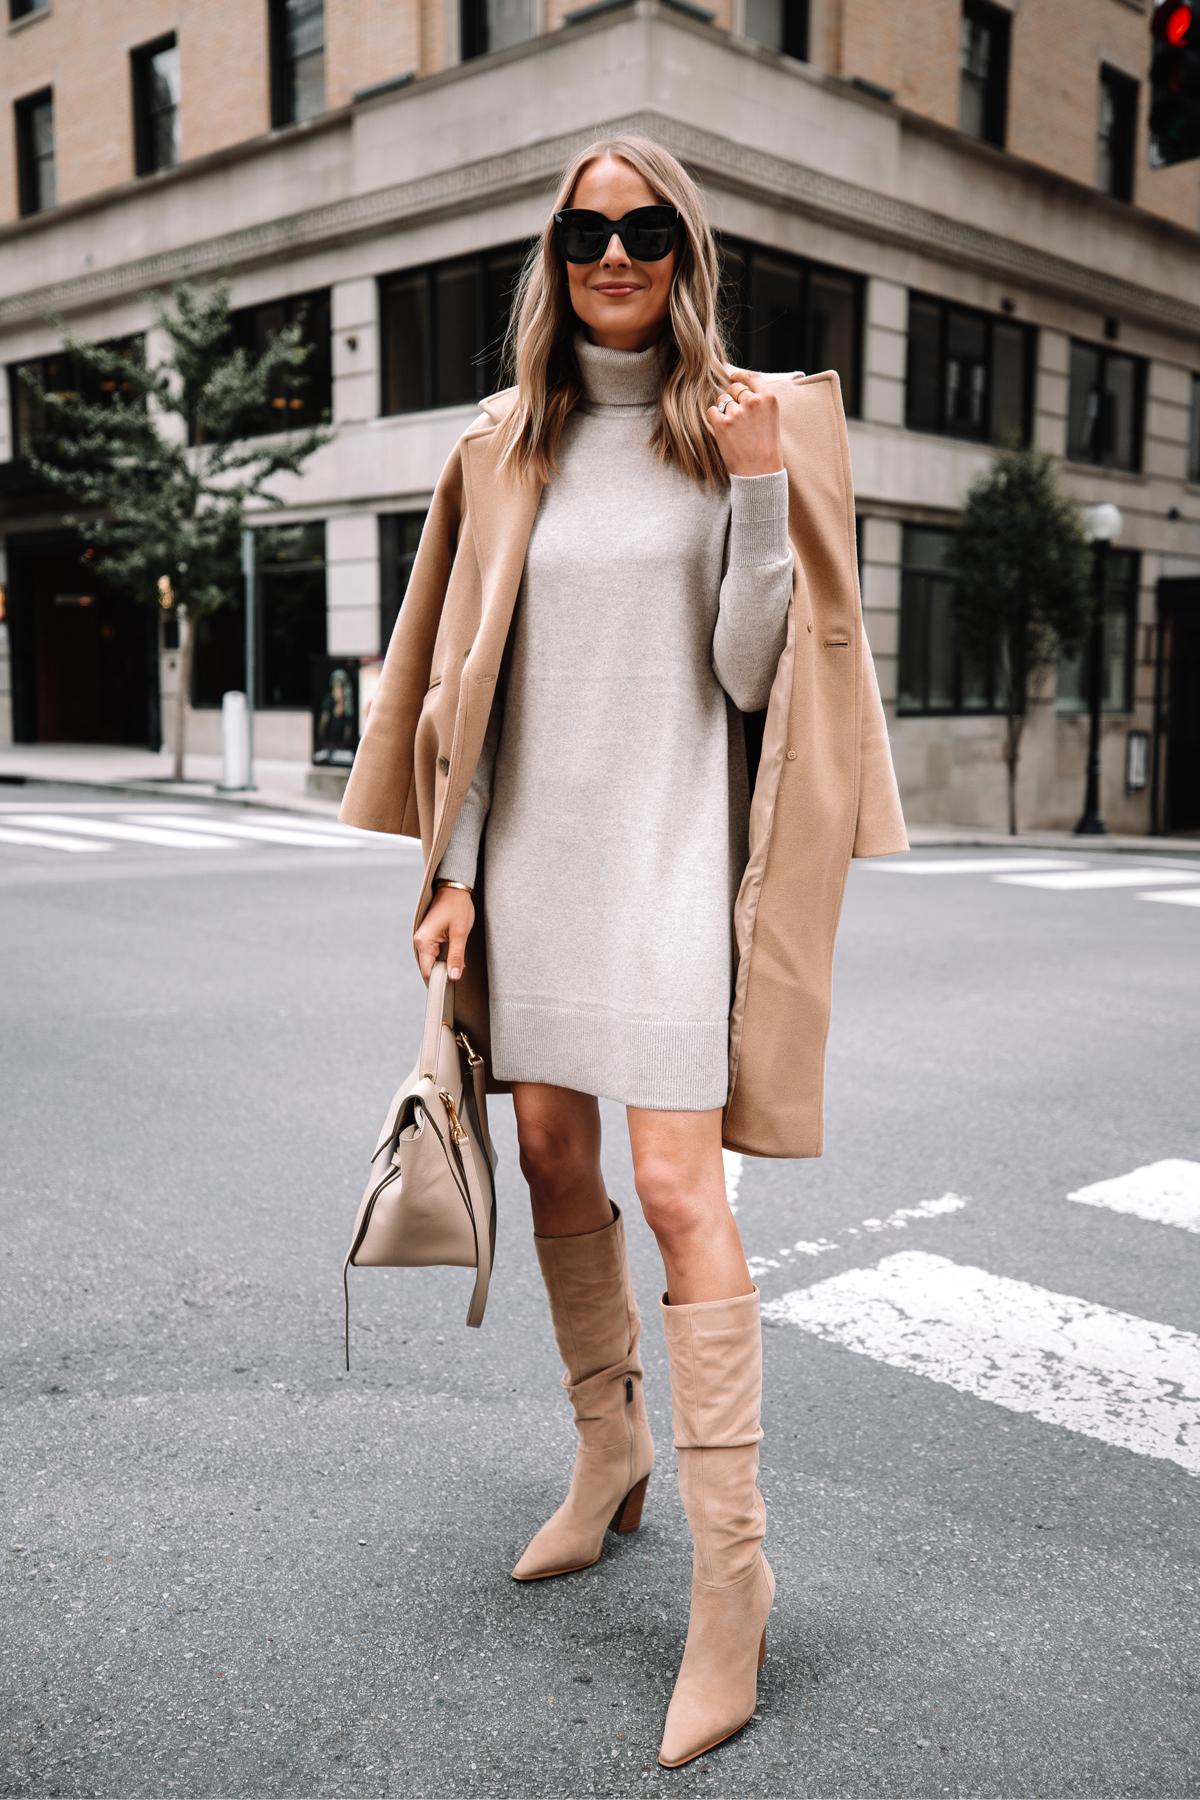 Fashion Jackson Wearing Everlane Camel Coat Everlane Beige Sweater Dress Celine Belt Bag Fall Outfit 3